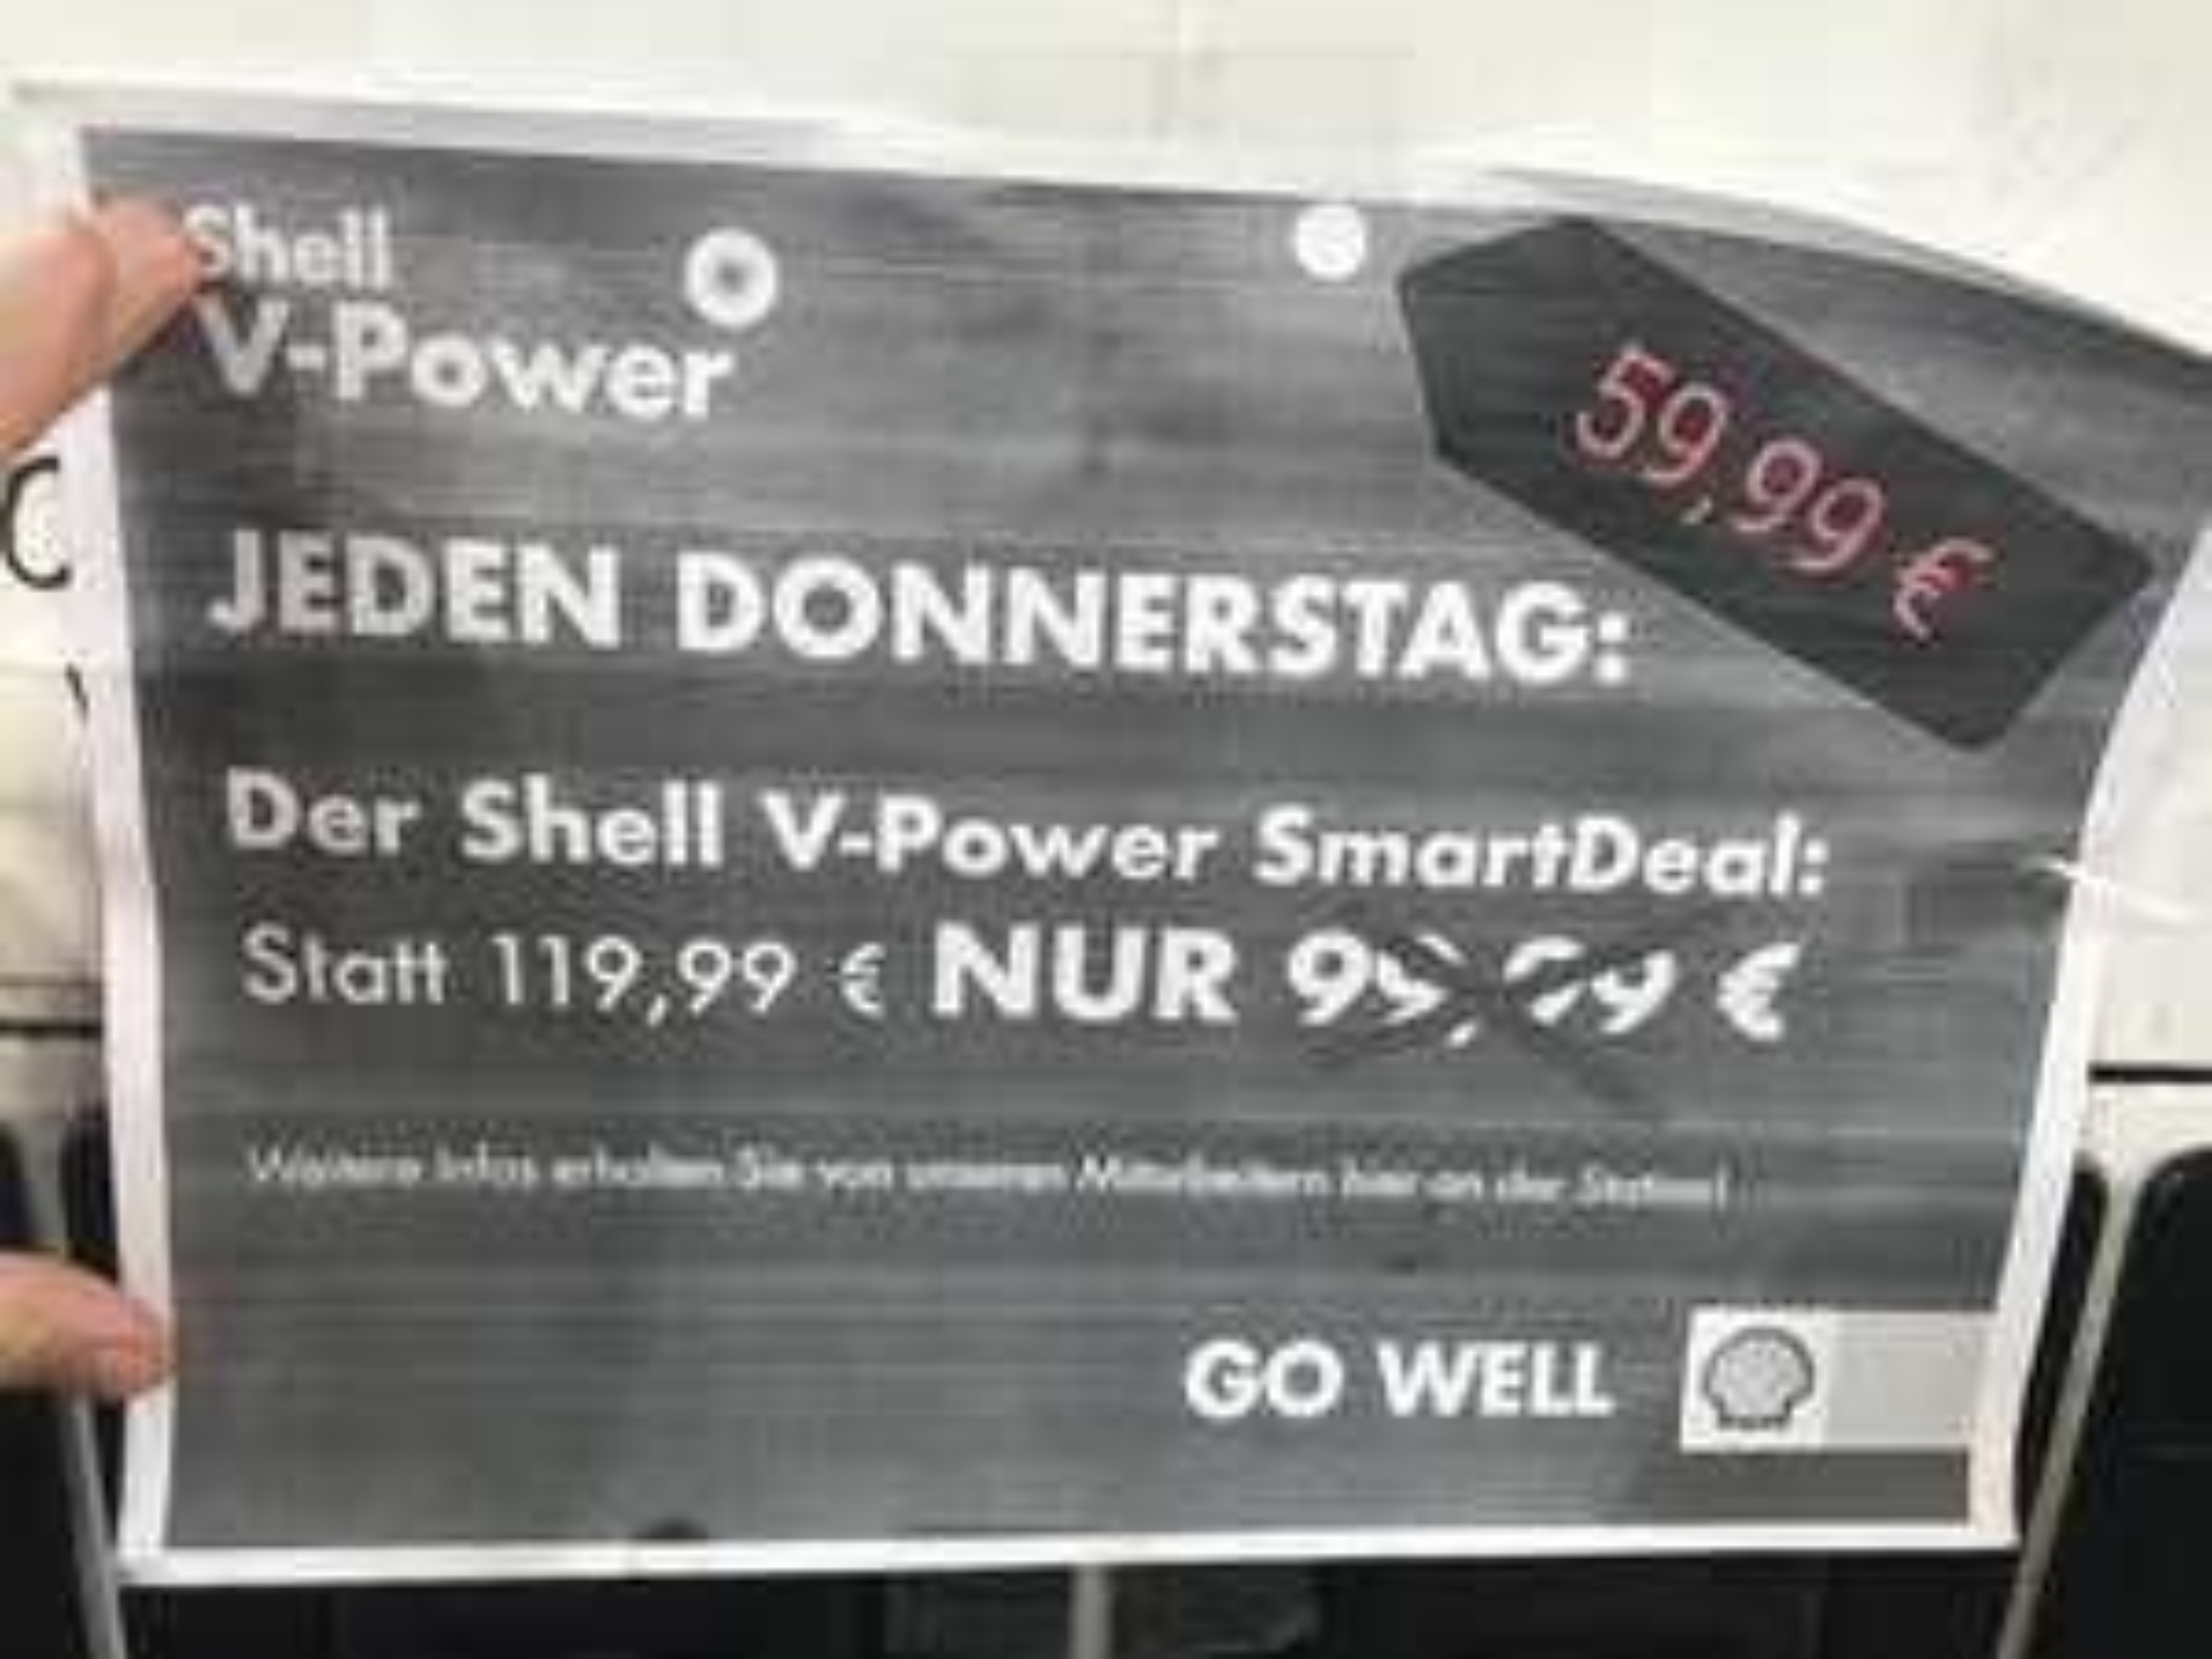 Lokal Hilden: 1 Jahr Shell SmartDeal V-Power 59,99 Euro